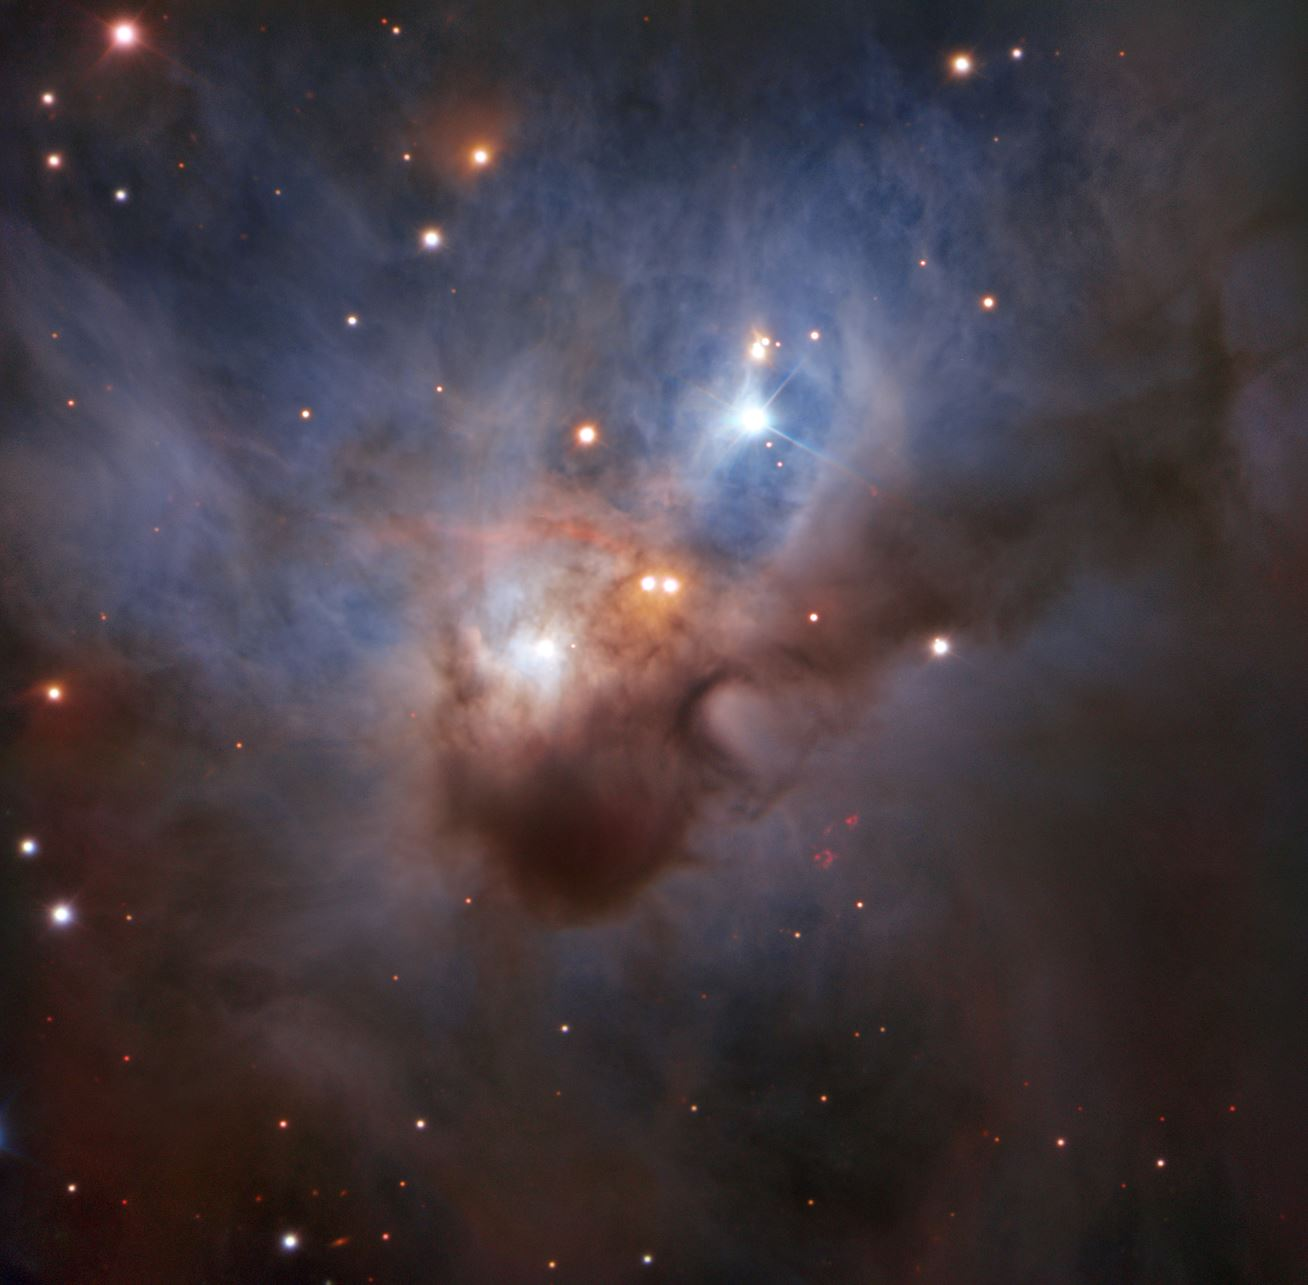 Image Credits: ESO (click to enlarge)